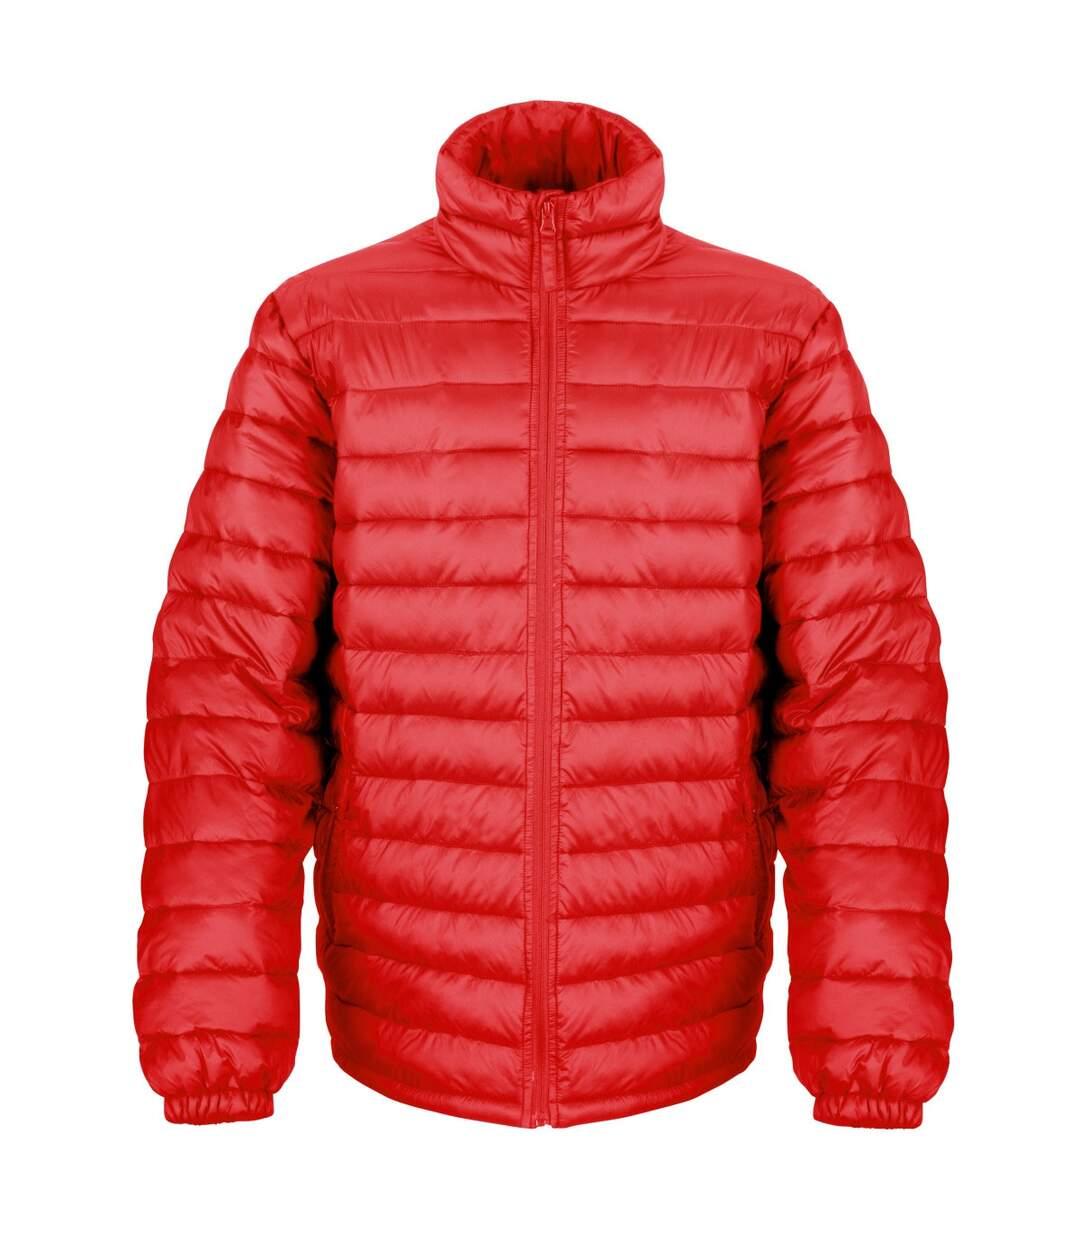 Result Mens Ice Bird Padded Winter Jacket (Water Repellent & Windproof) (Red) - UTBC2048